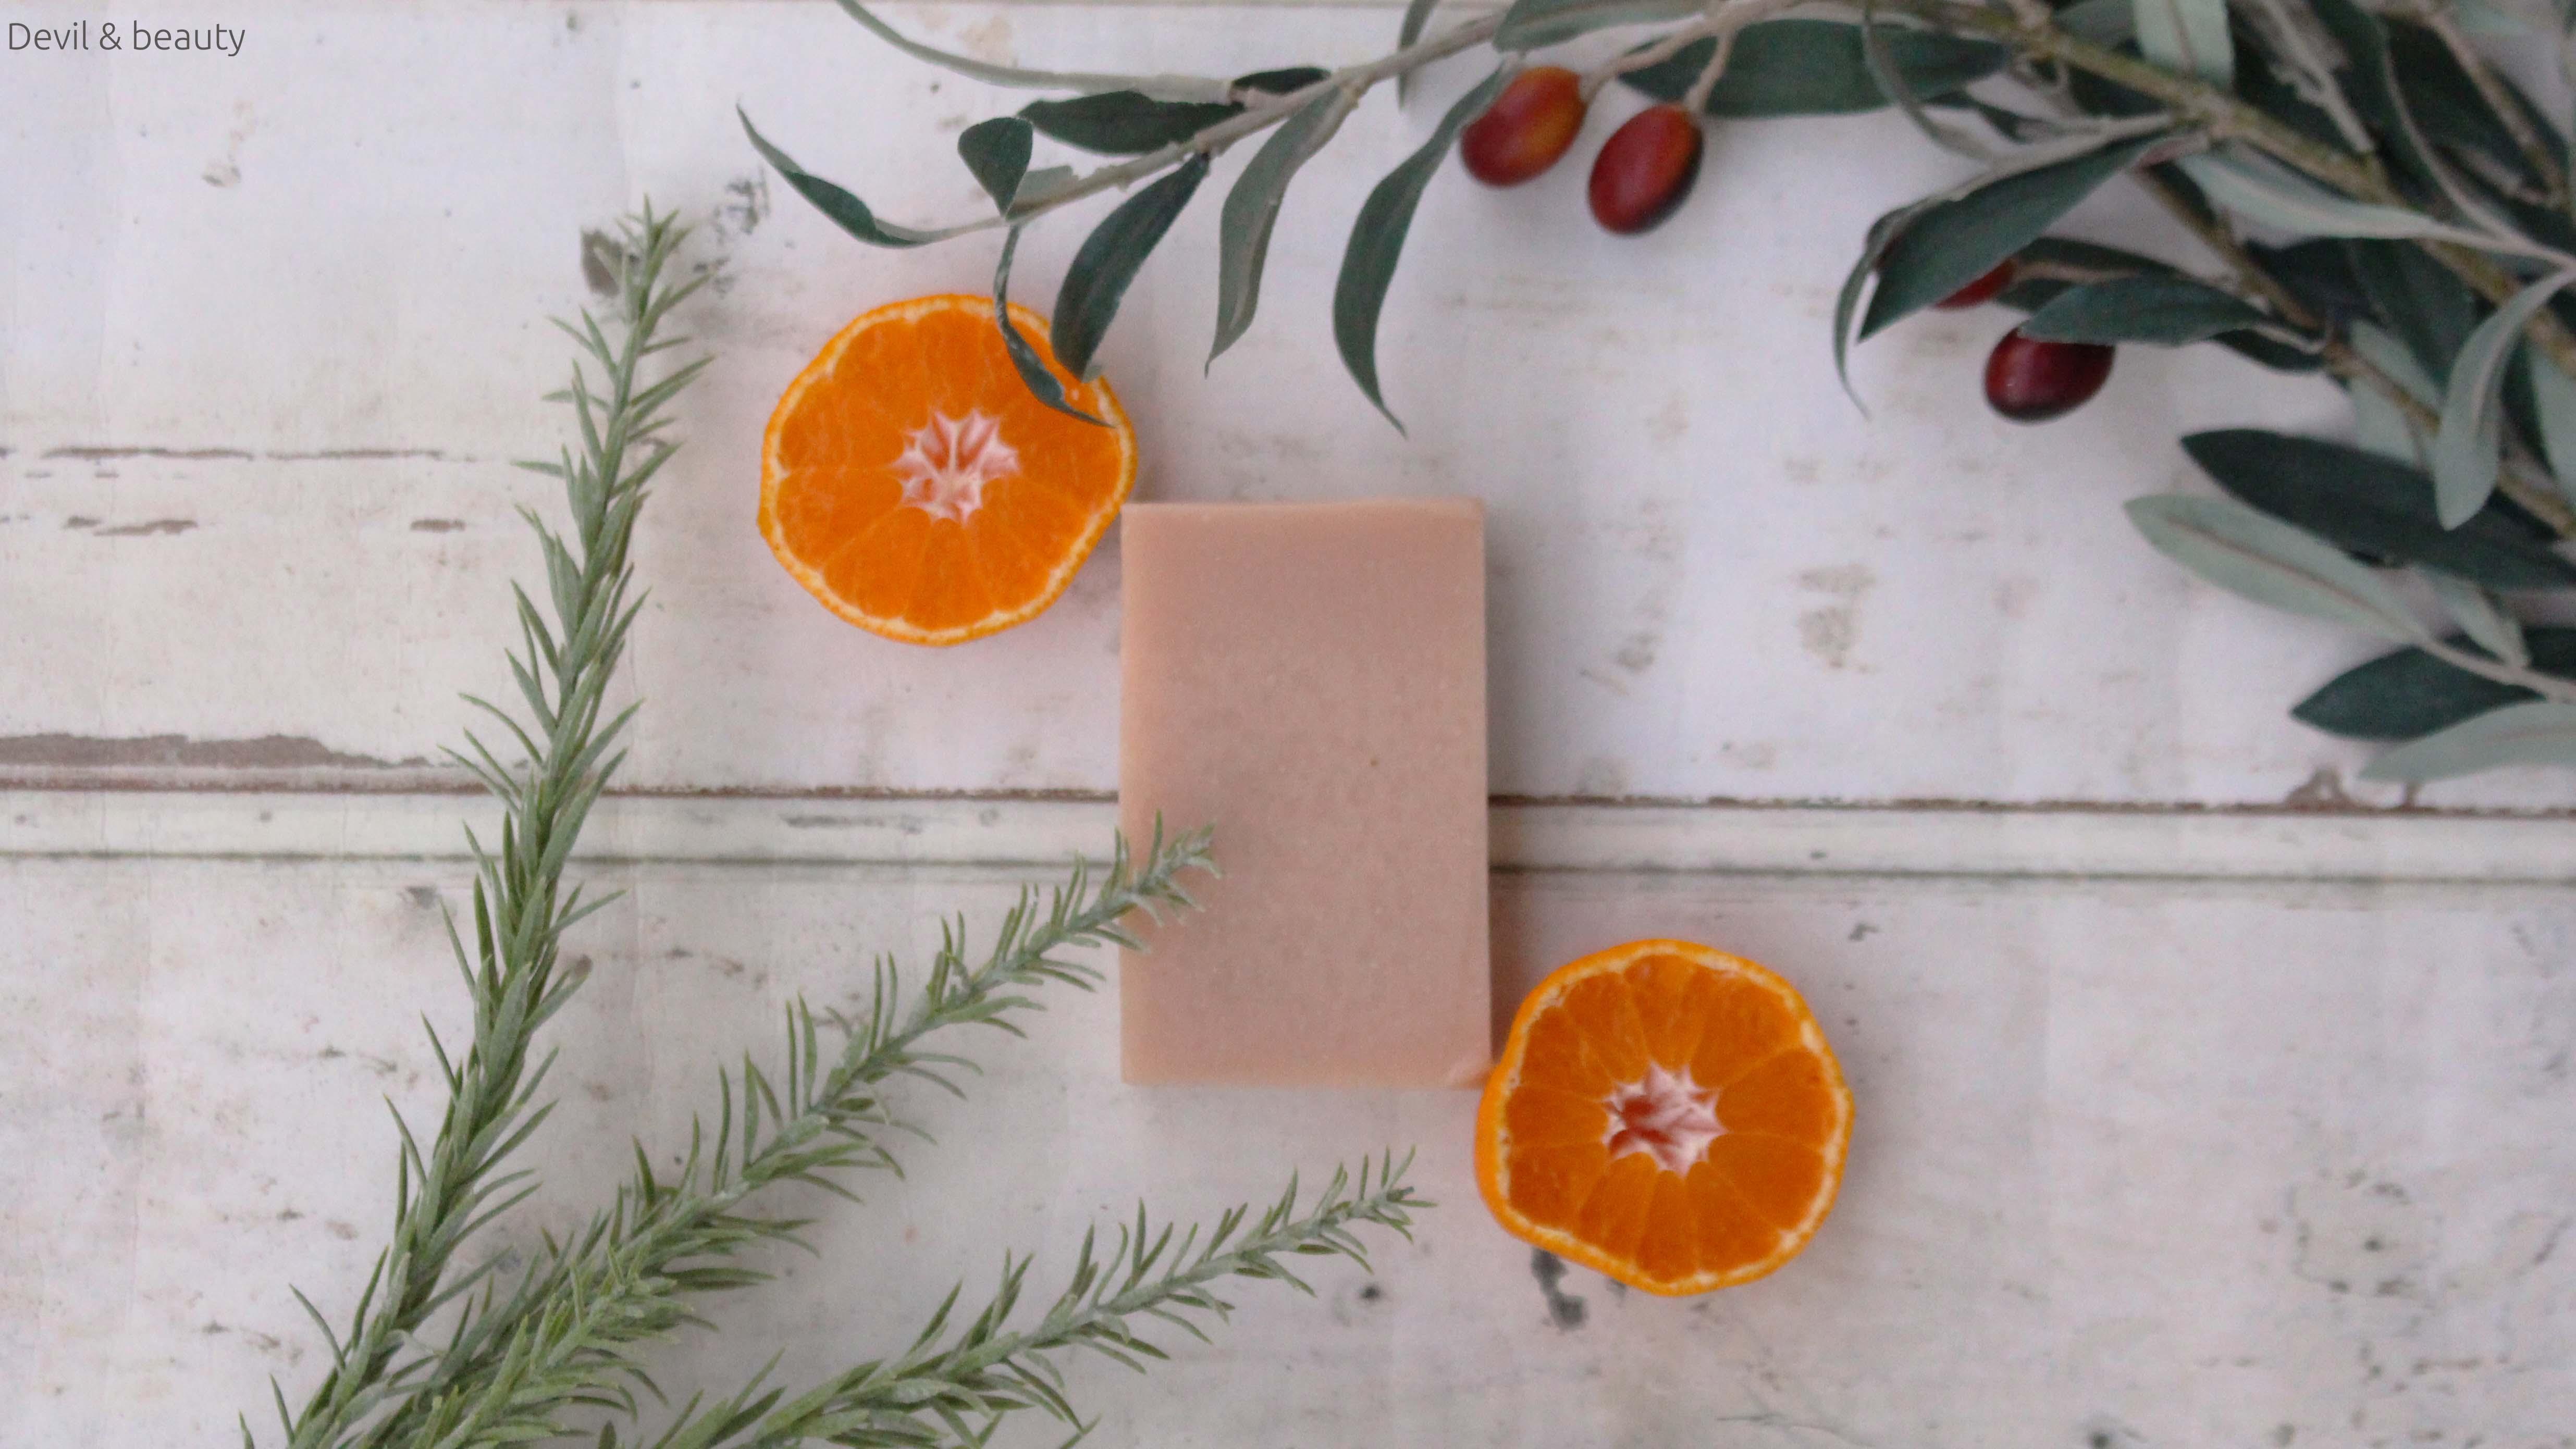 moon-soap-sicily1 - image